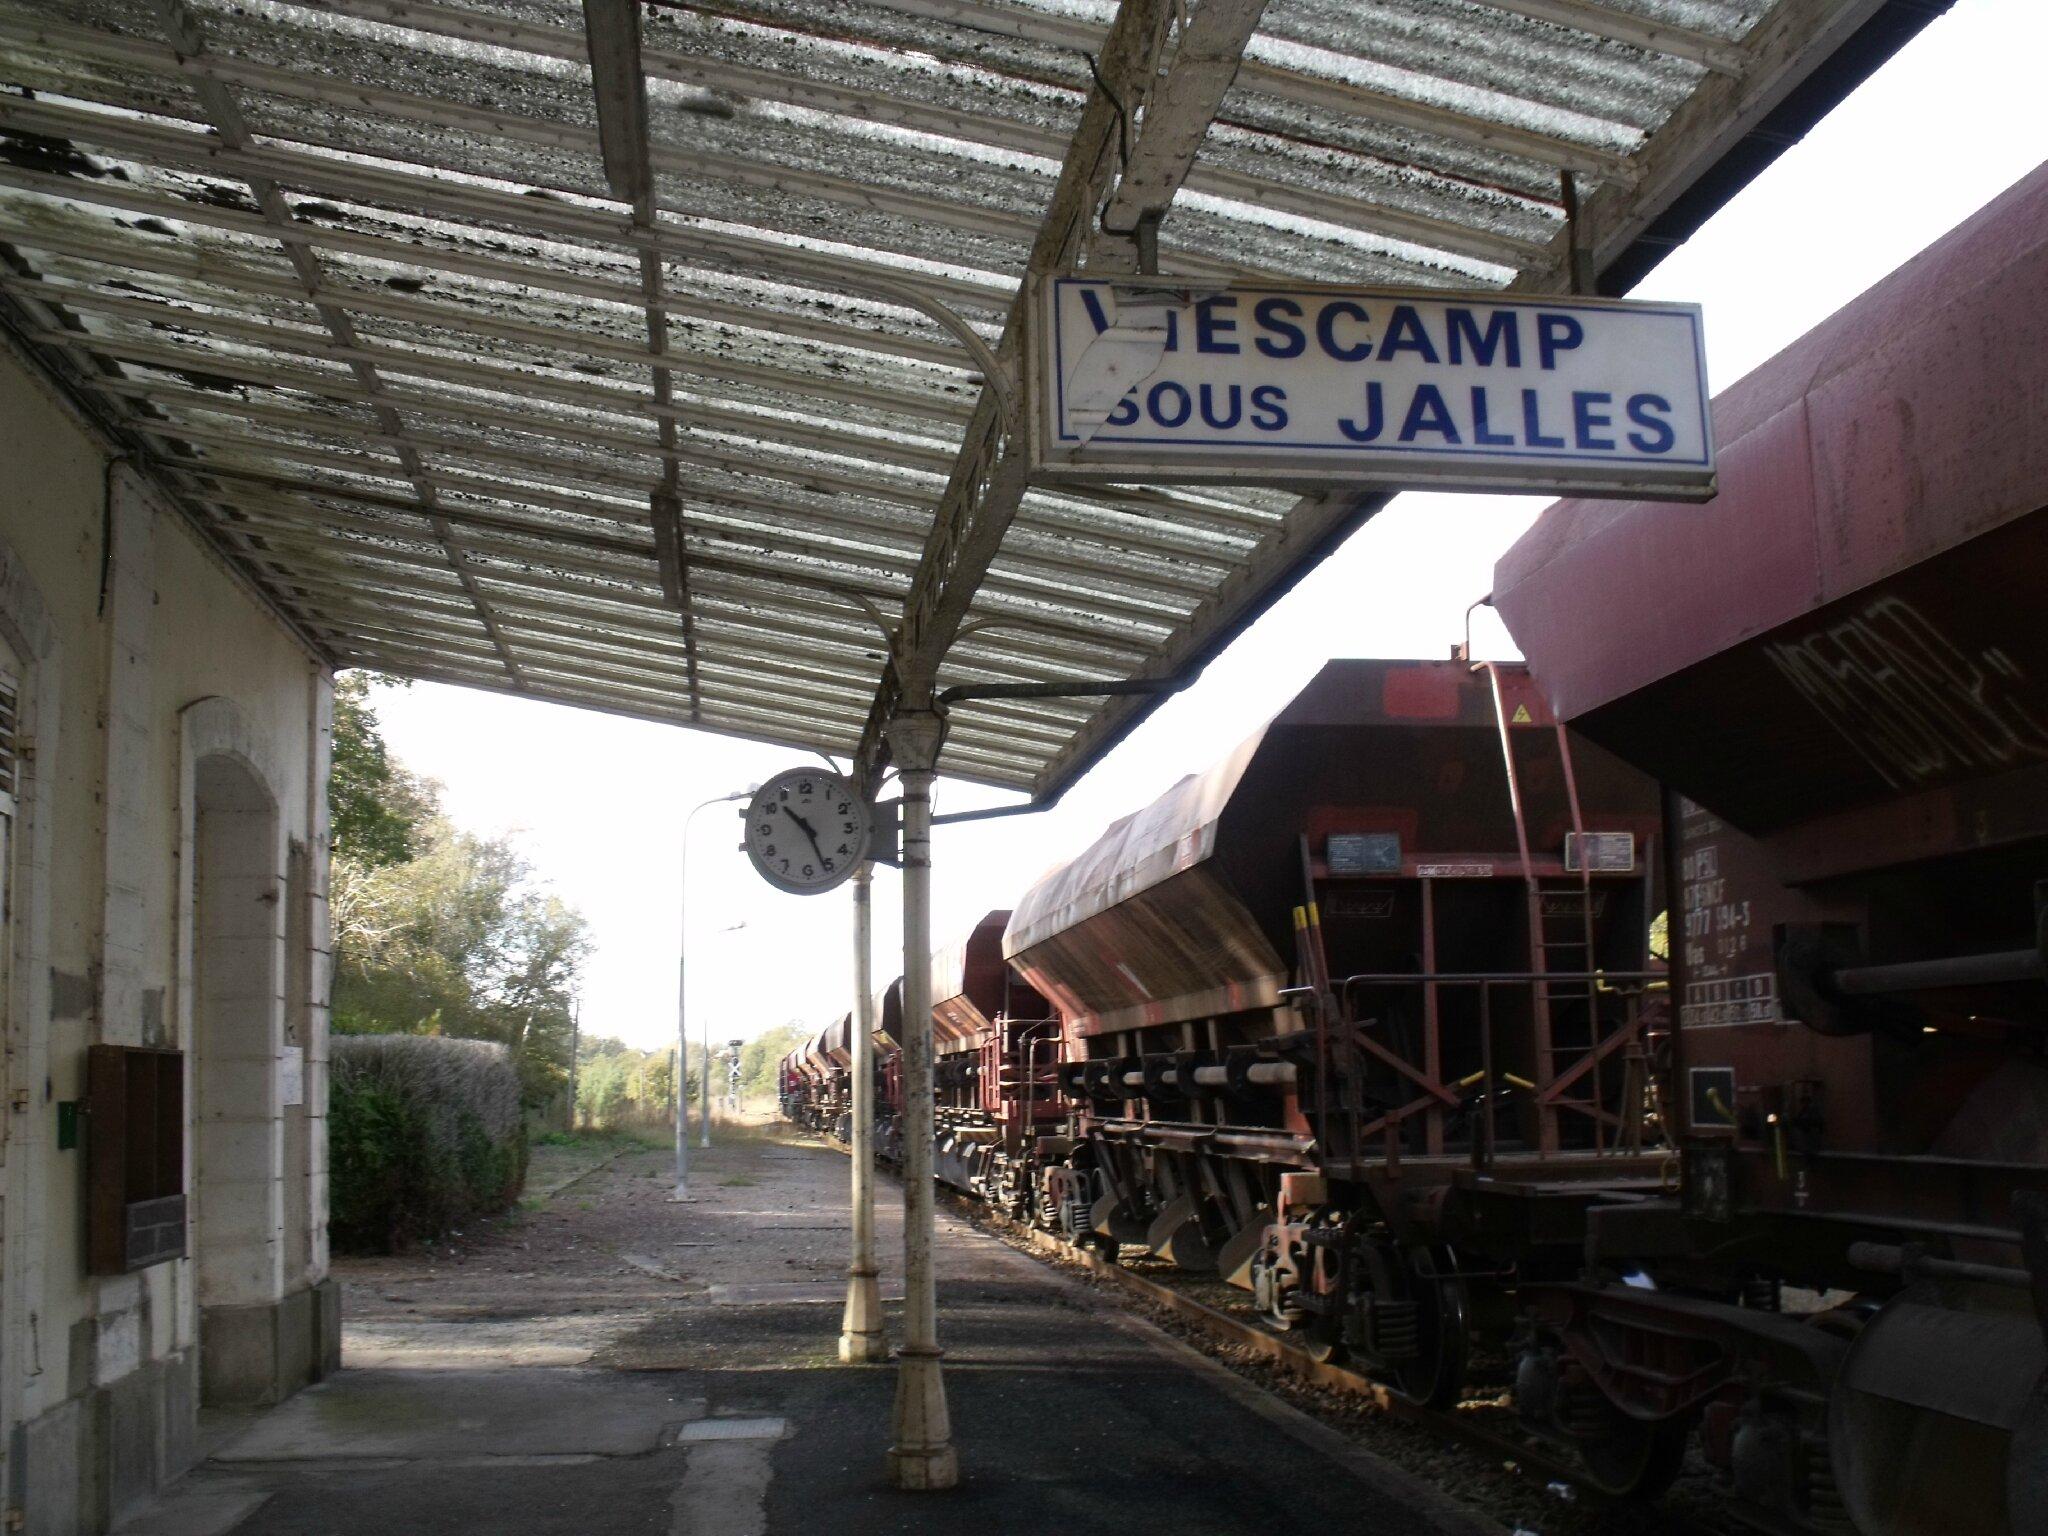 Viescamp-sous-Jallès (Cantal - 15)